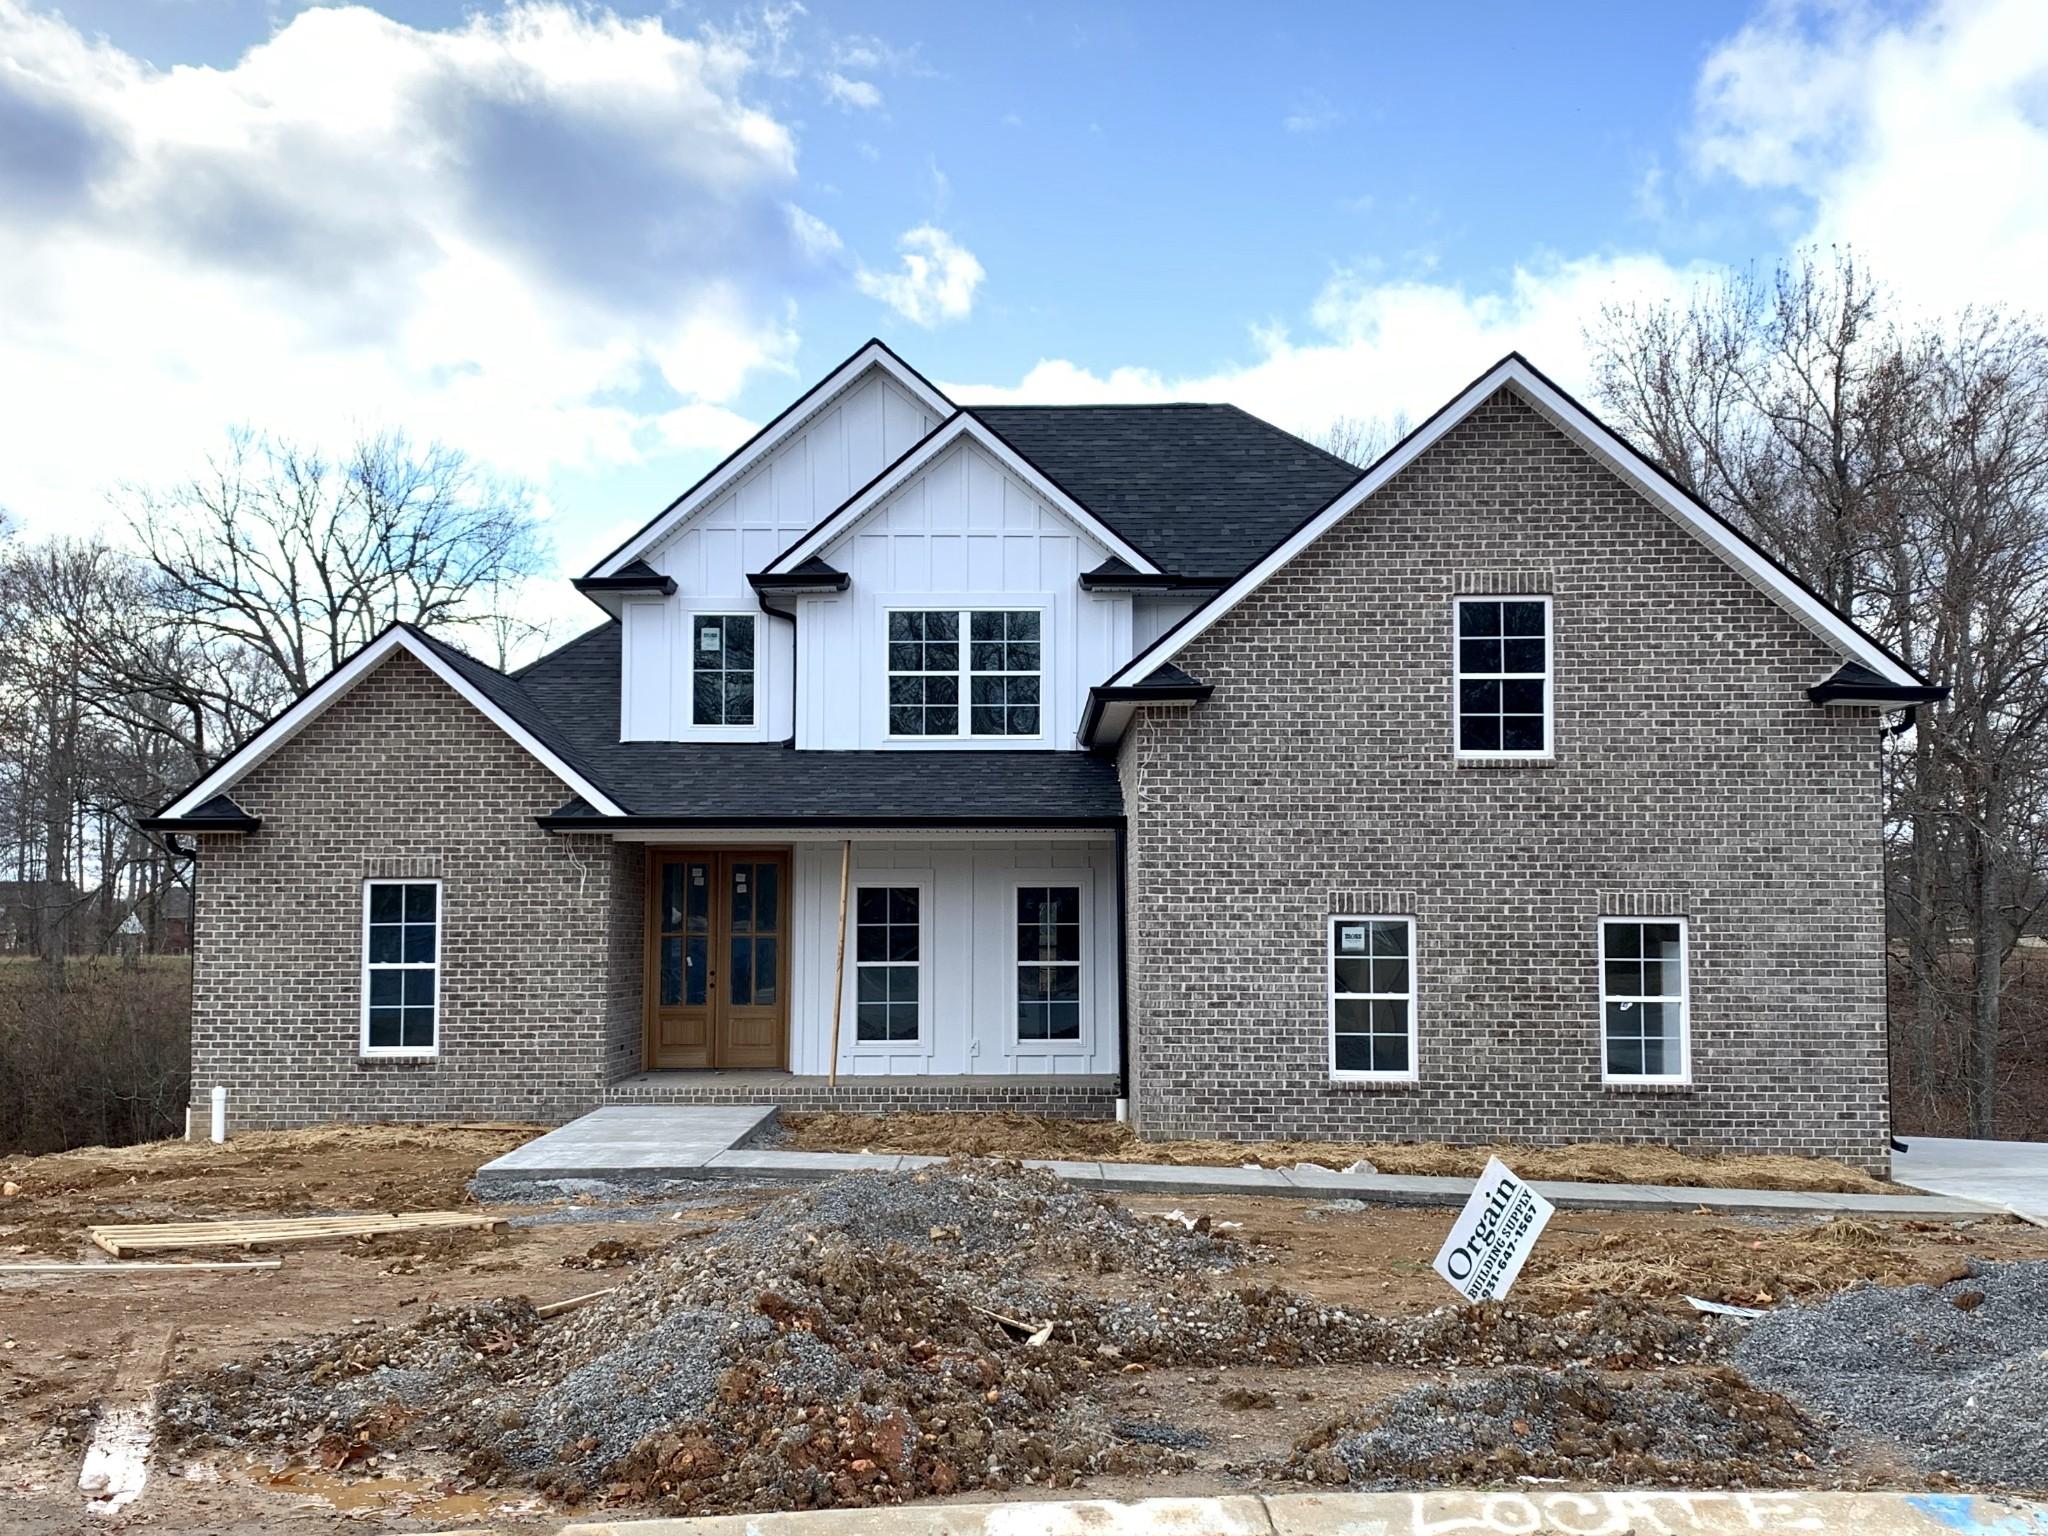 21 Whitewood Farm, Clarksville, TN 37043 - Clarksville, TN real estate listing